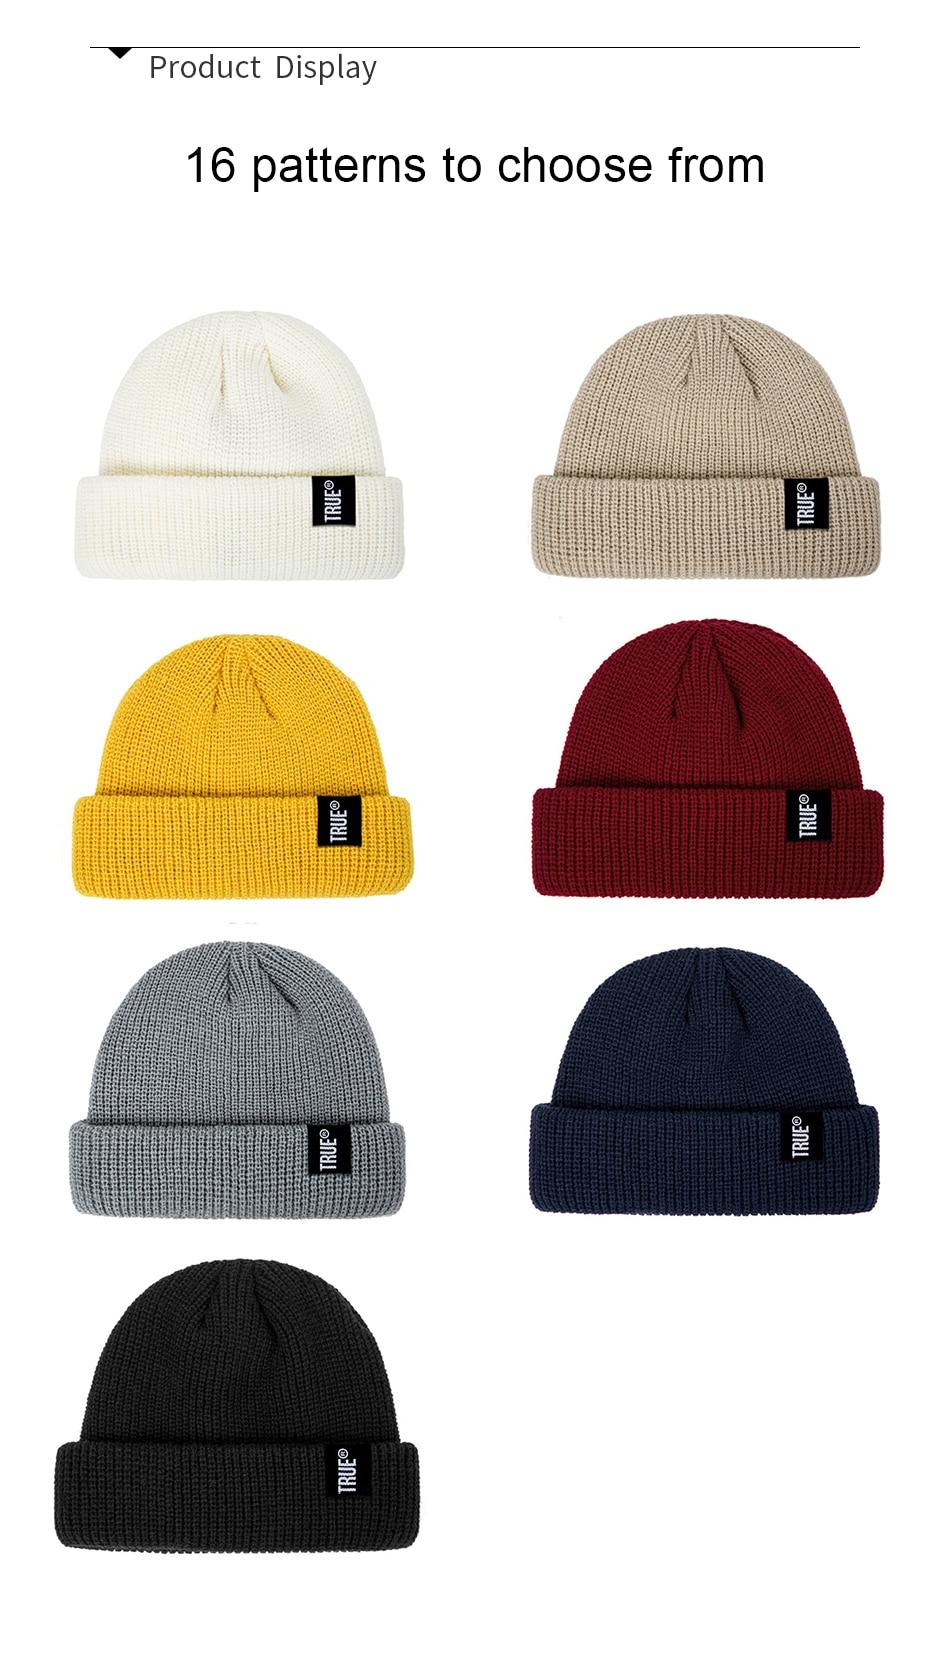 2019 Fashion Unisex Winter Hat Men Cuffed Cib Knit Hat Short Melon Ski Beanies Autumn Winter Solid Color Casual Beanie Hat 22